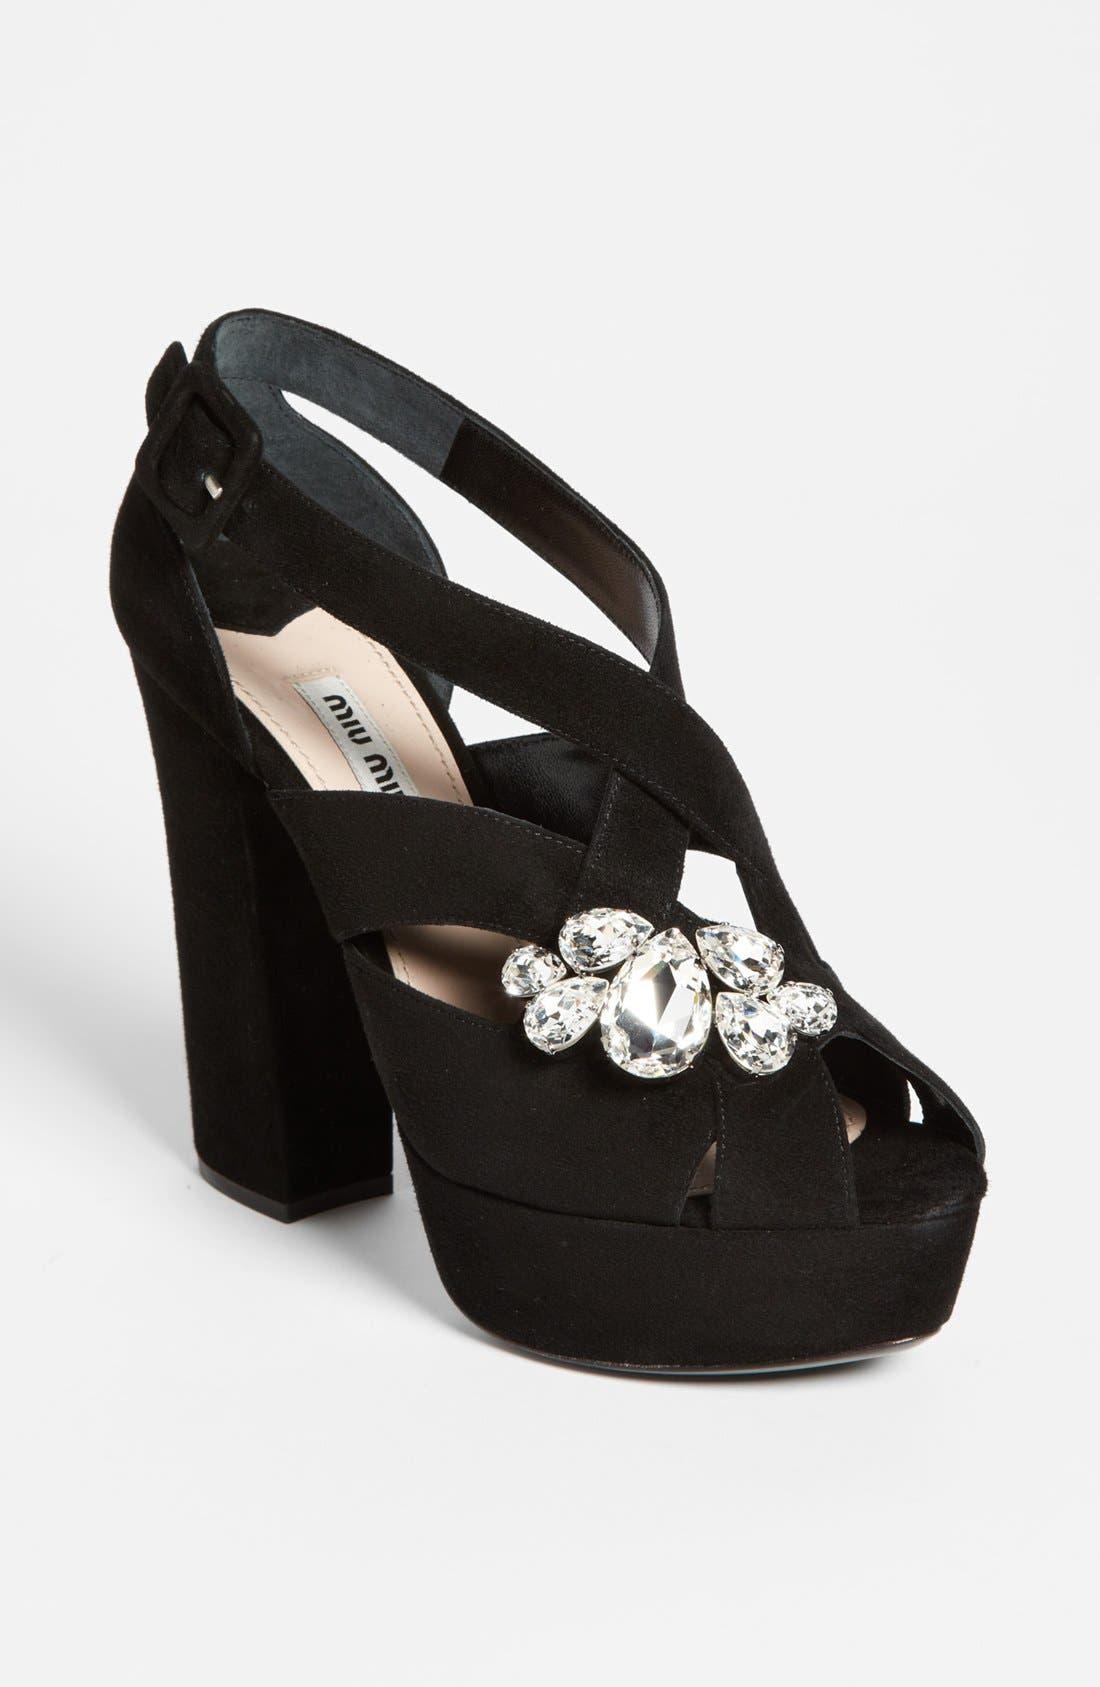 Main Image - Miu Miu Jewel Platform Sandal